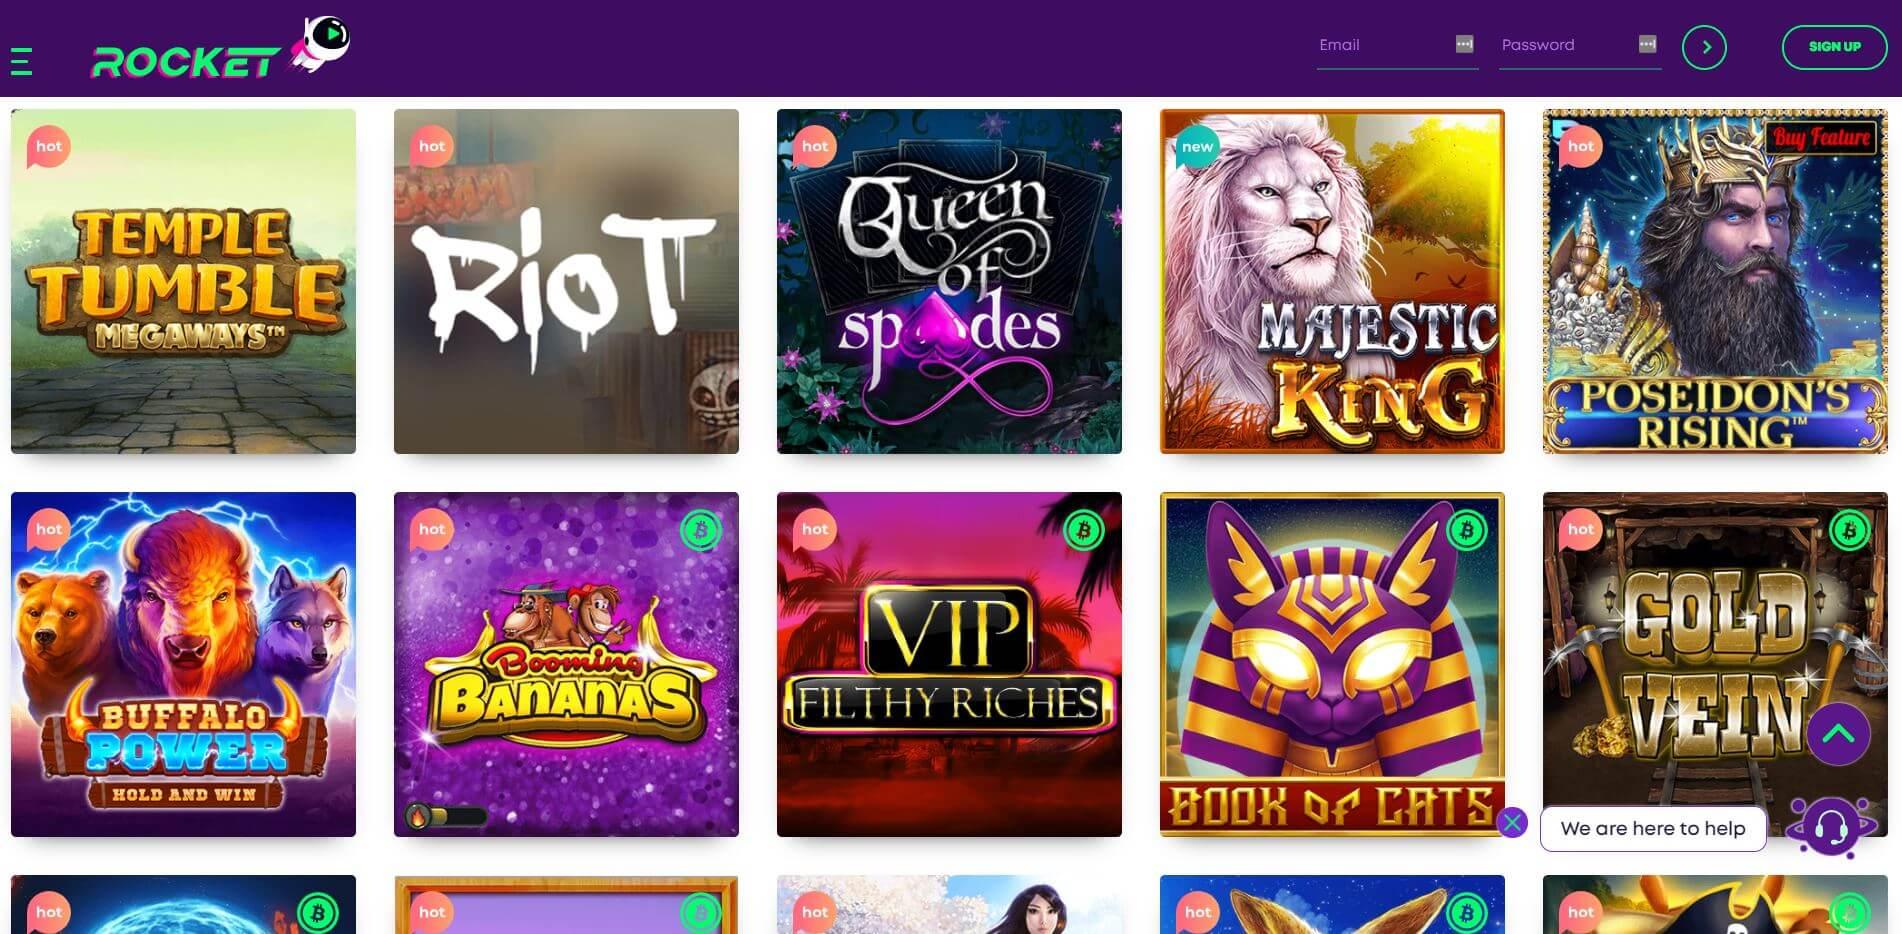 Casino Rocket Homepage